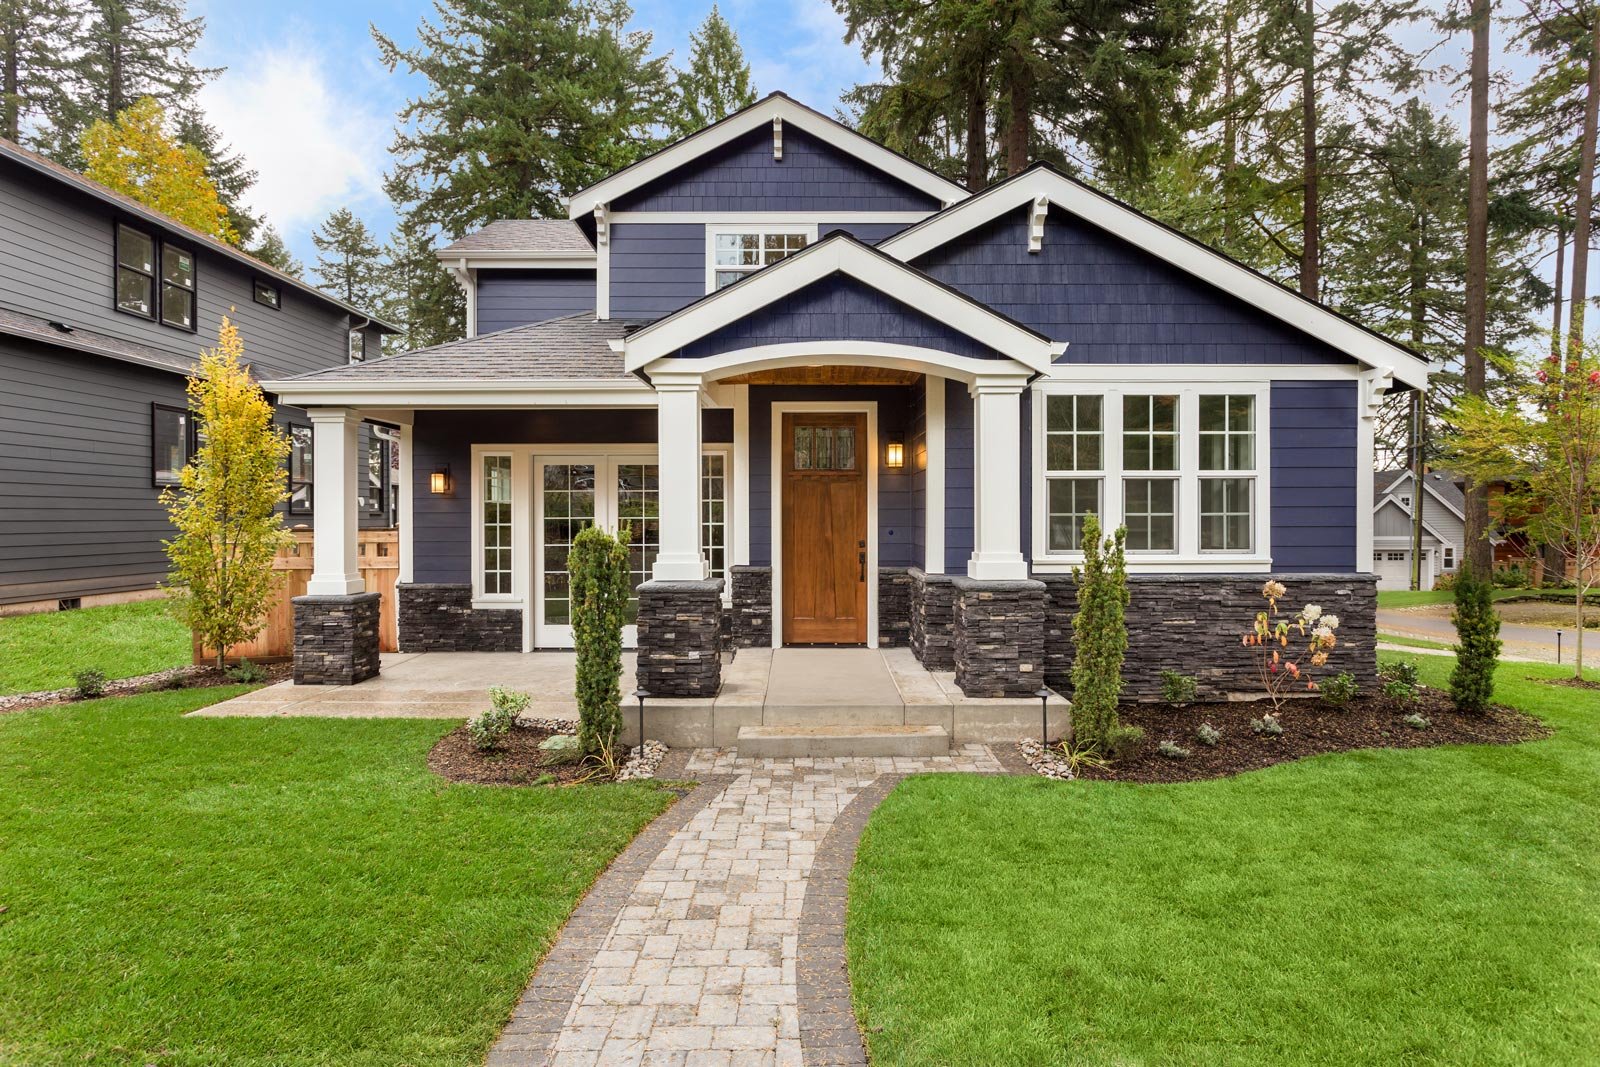 Stan ili kuća